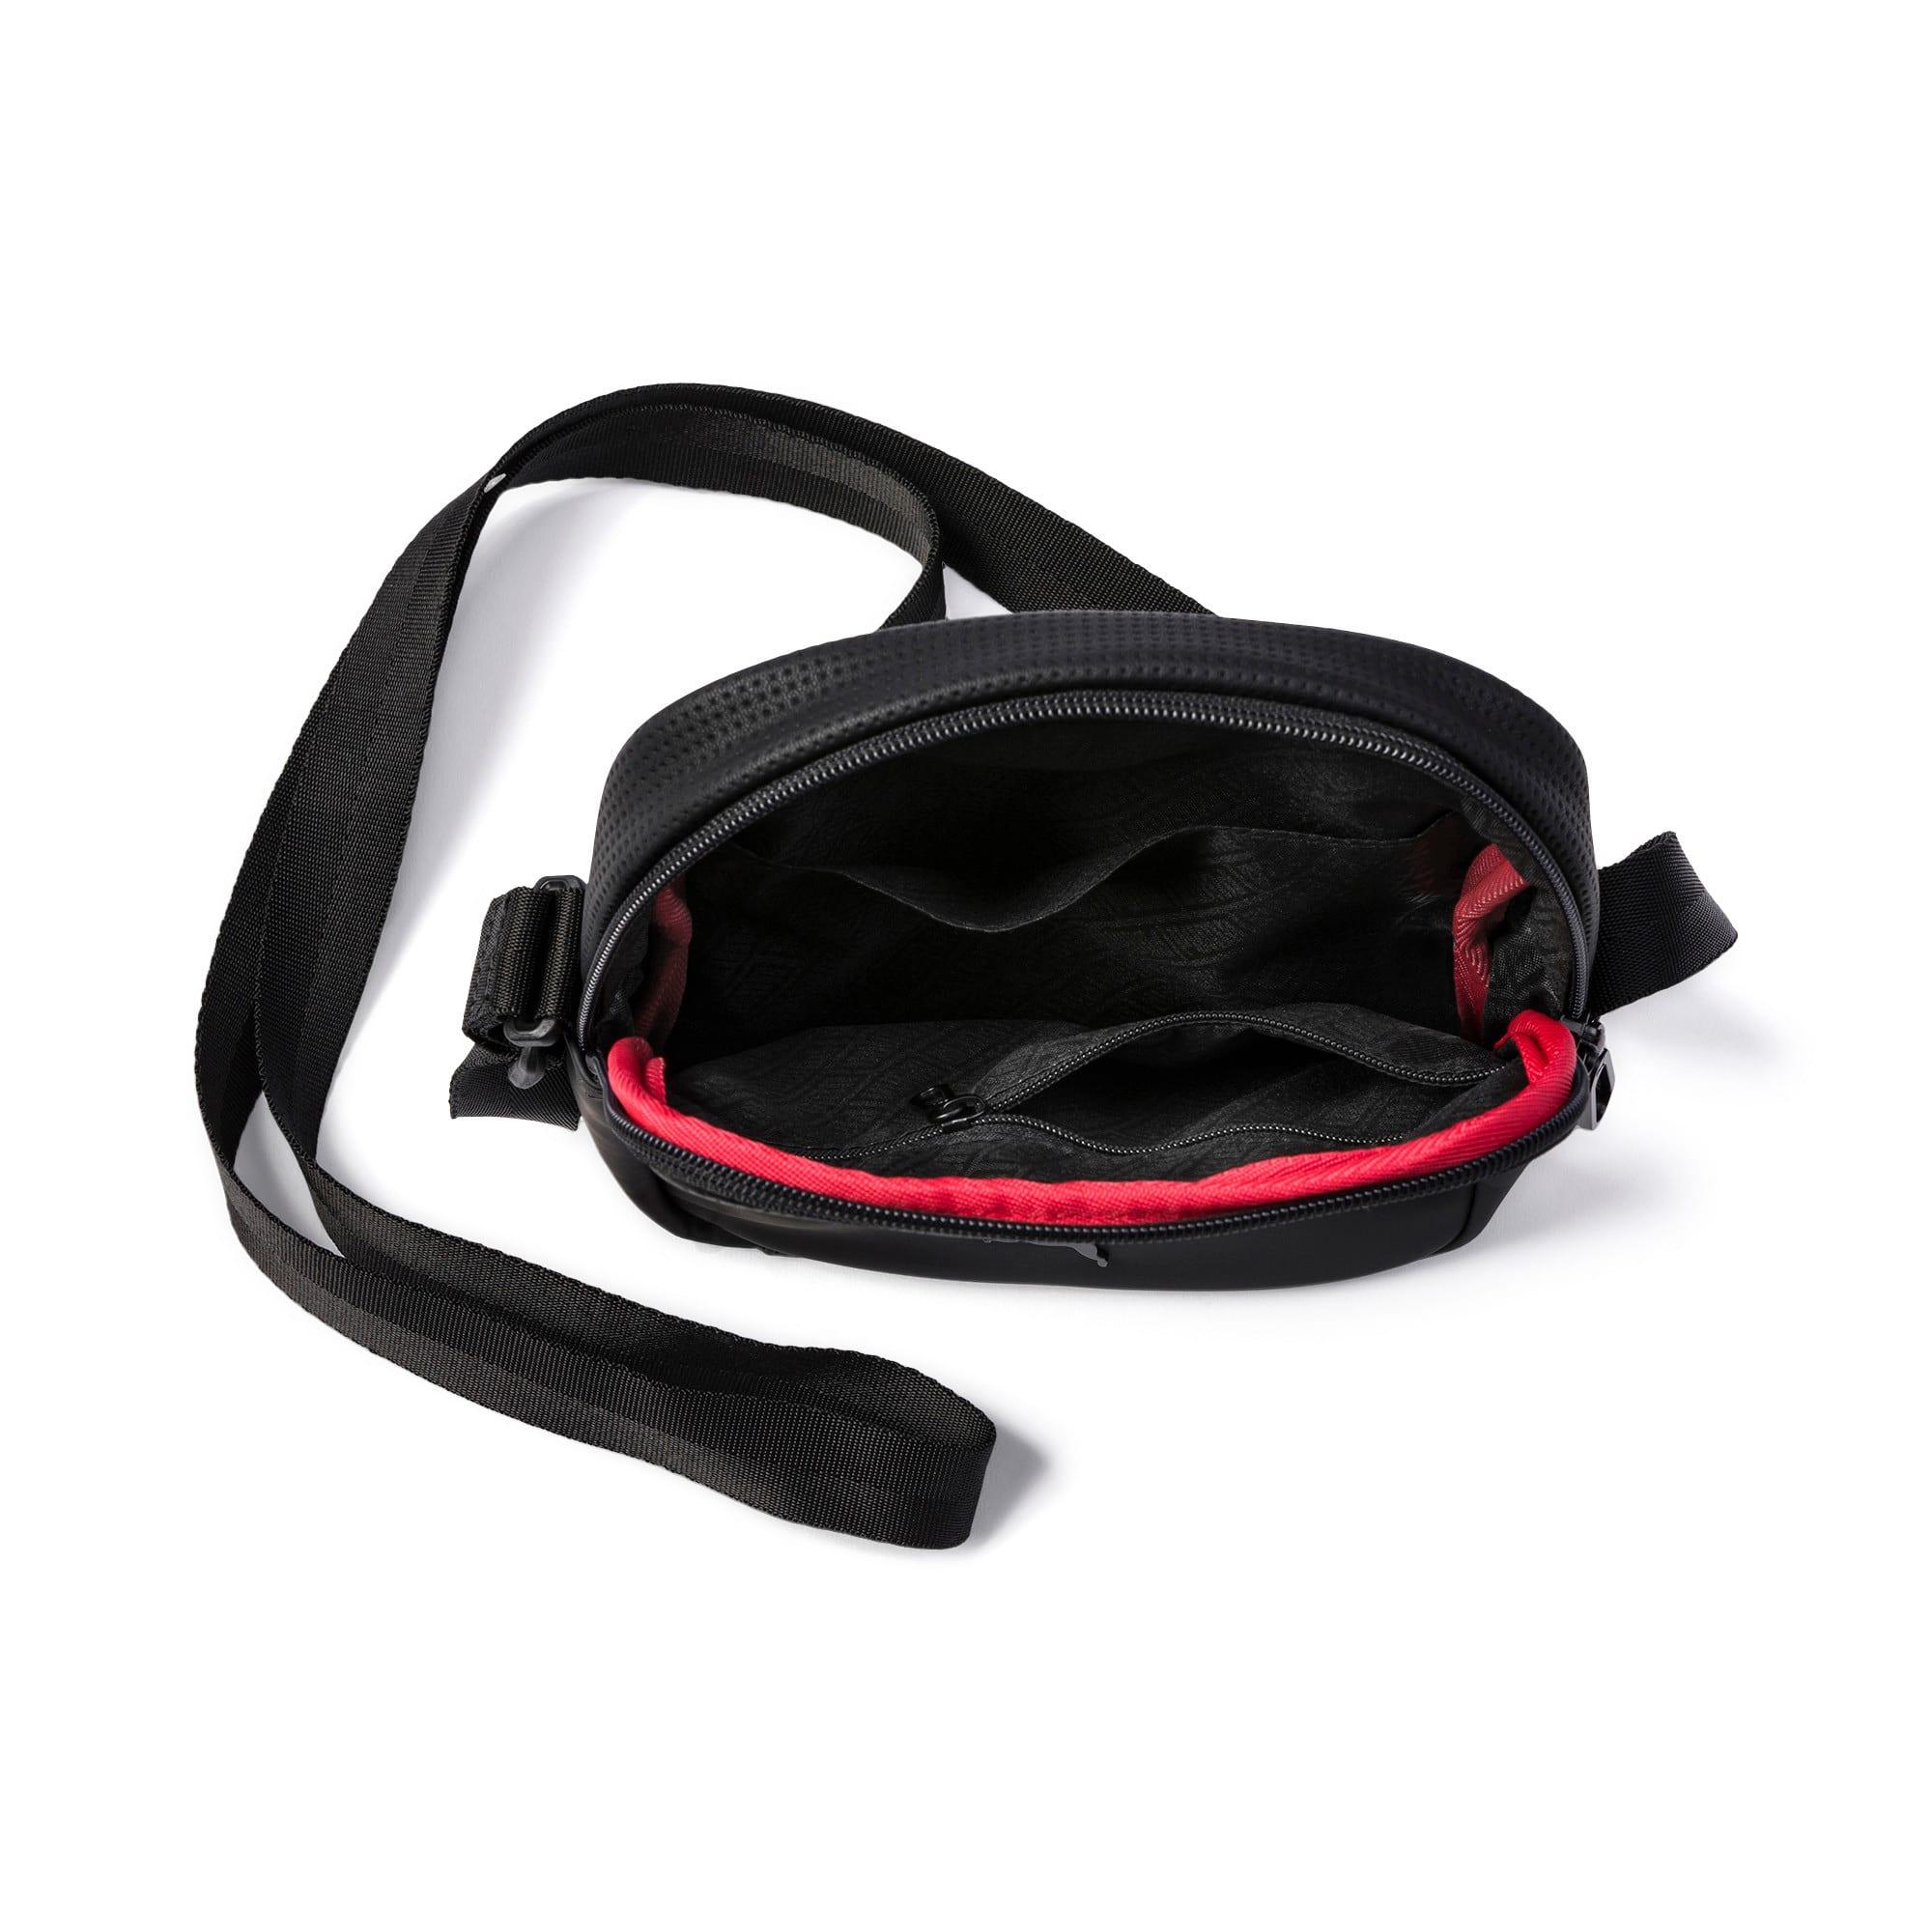 Thumbnail 4 of Ferrari Lifestyle Portable Bag, Puma Black, medium-IND